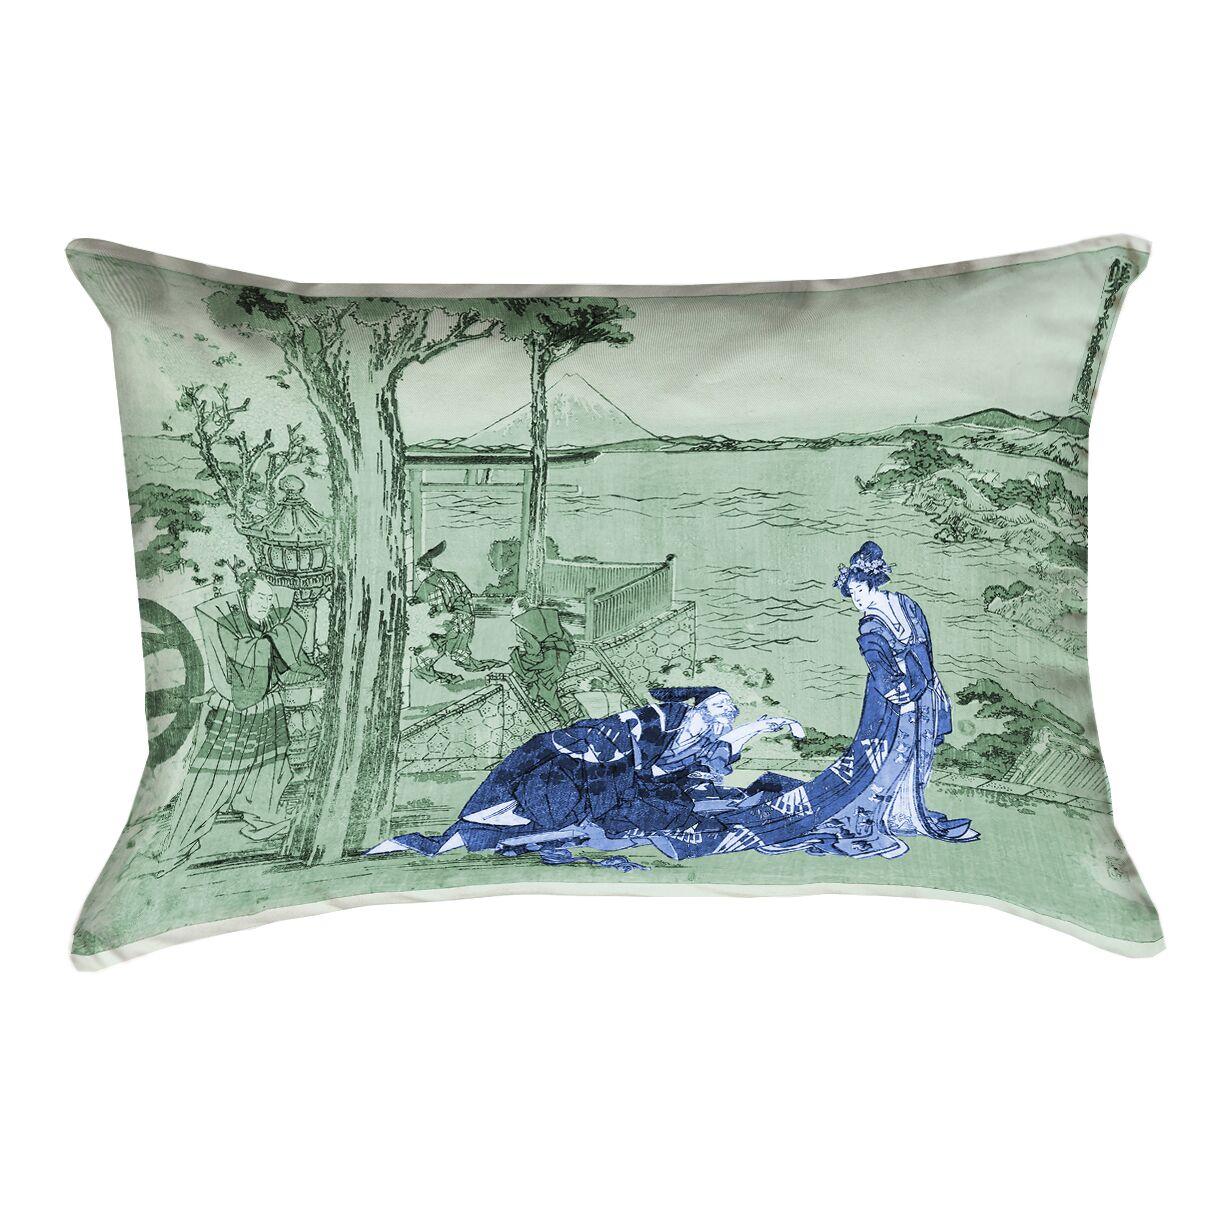 Enya Japanese Courtesan Double Sided Print Lumbar Pillow  Color: Blue/Green